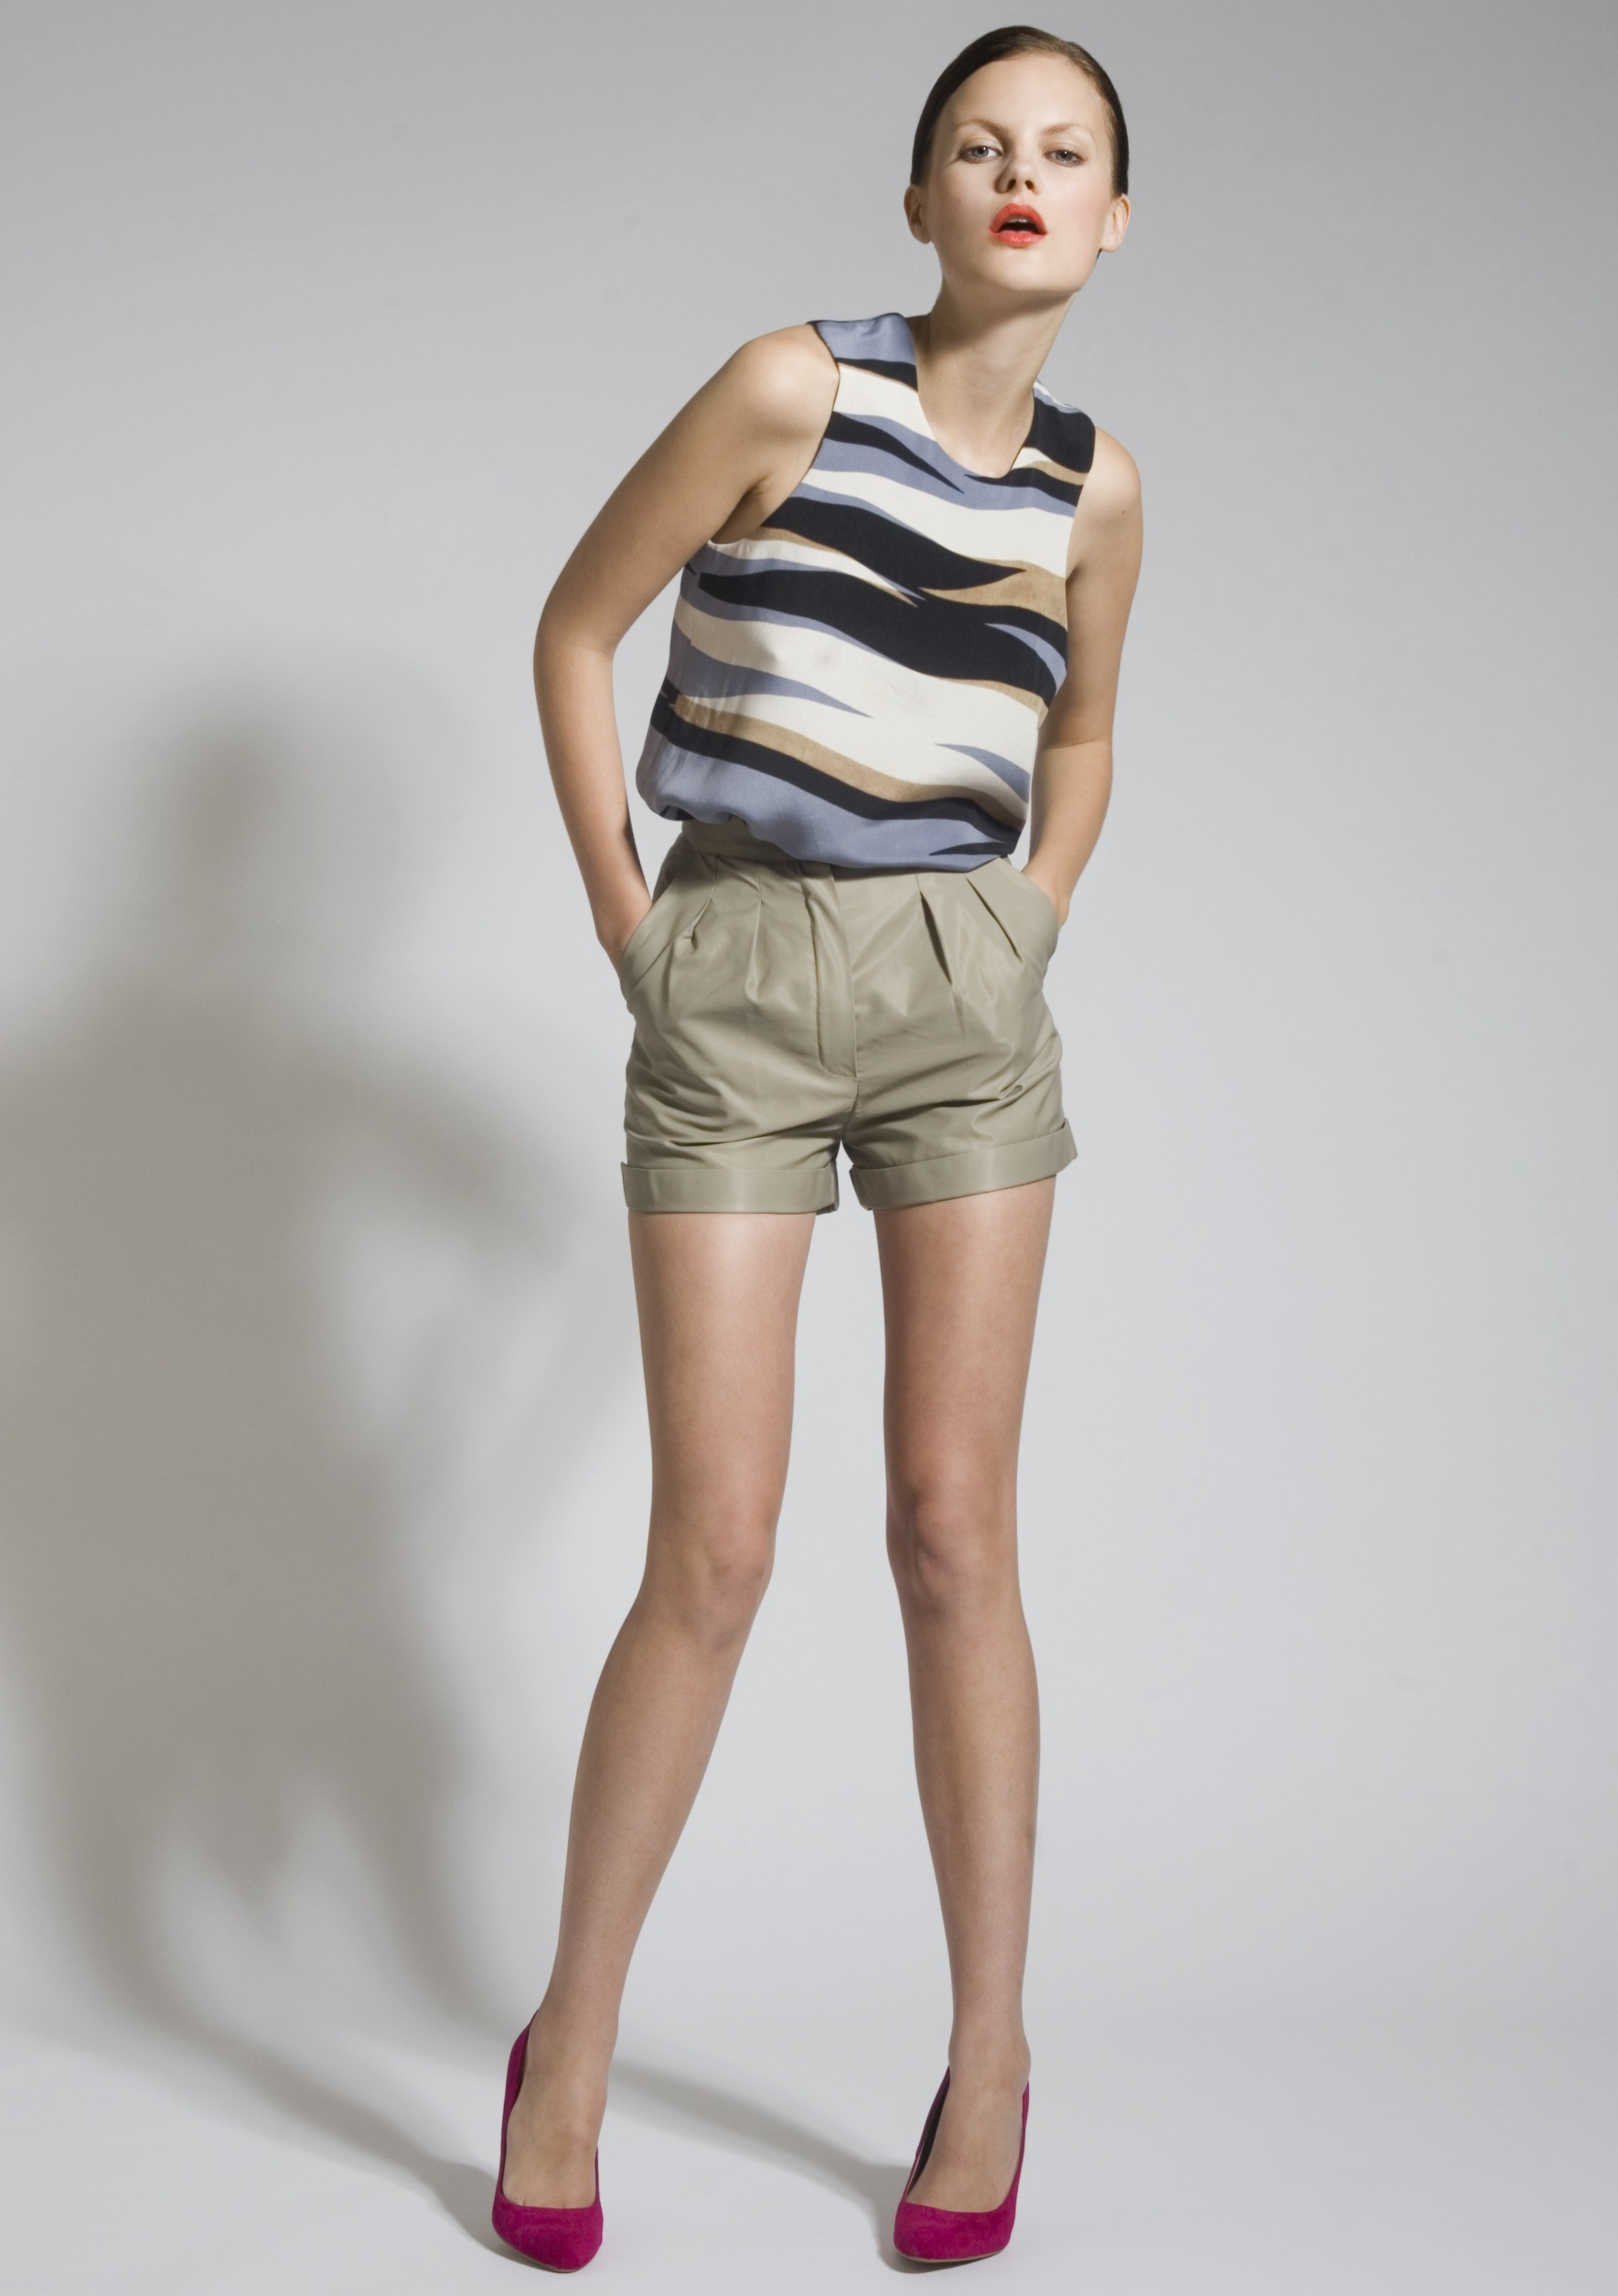 3 Silk Screen Vest, Cotton Mix Shorts.jpg